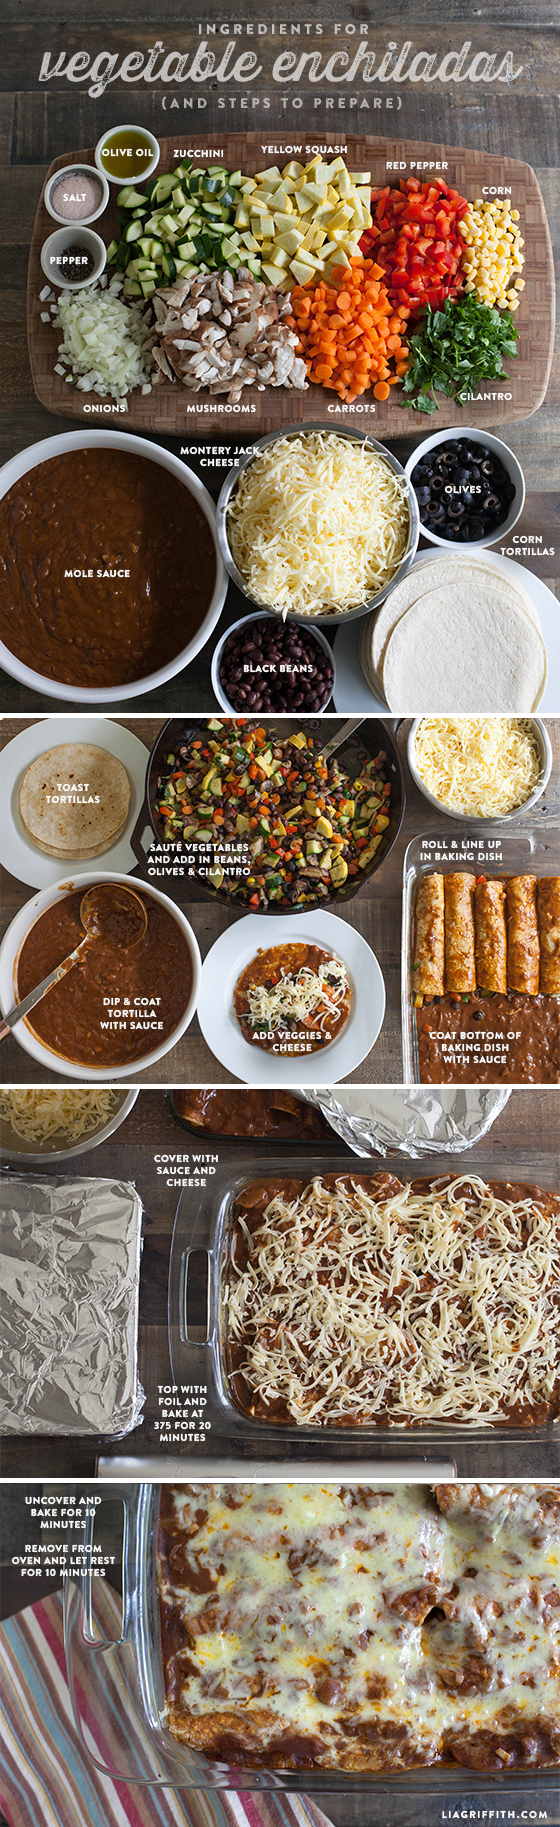 vegetable-enchilada-recipe